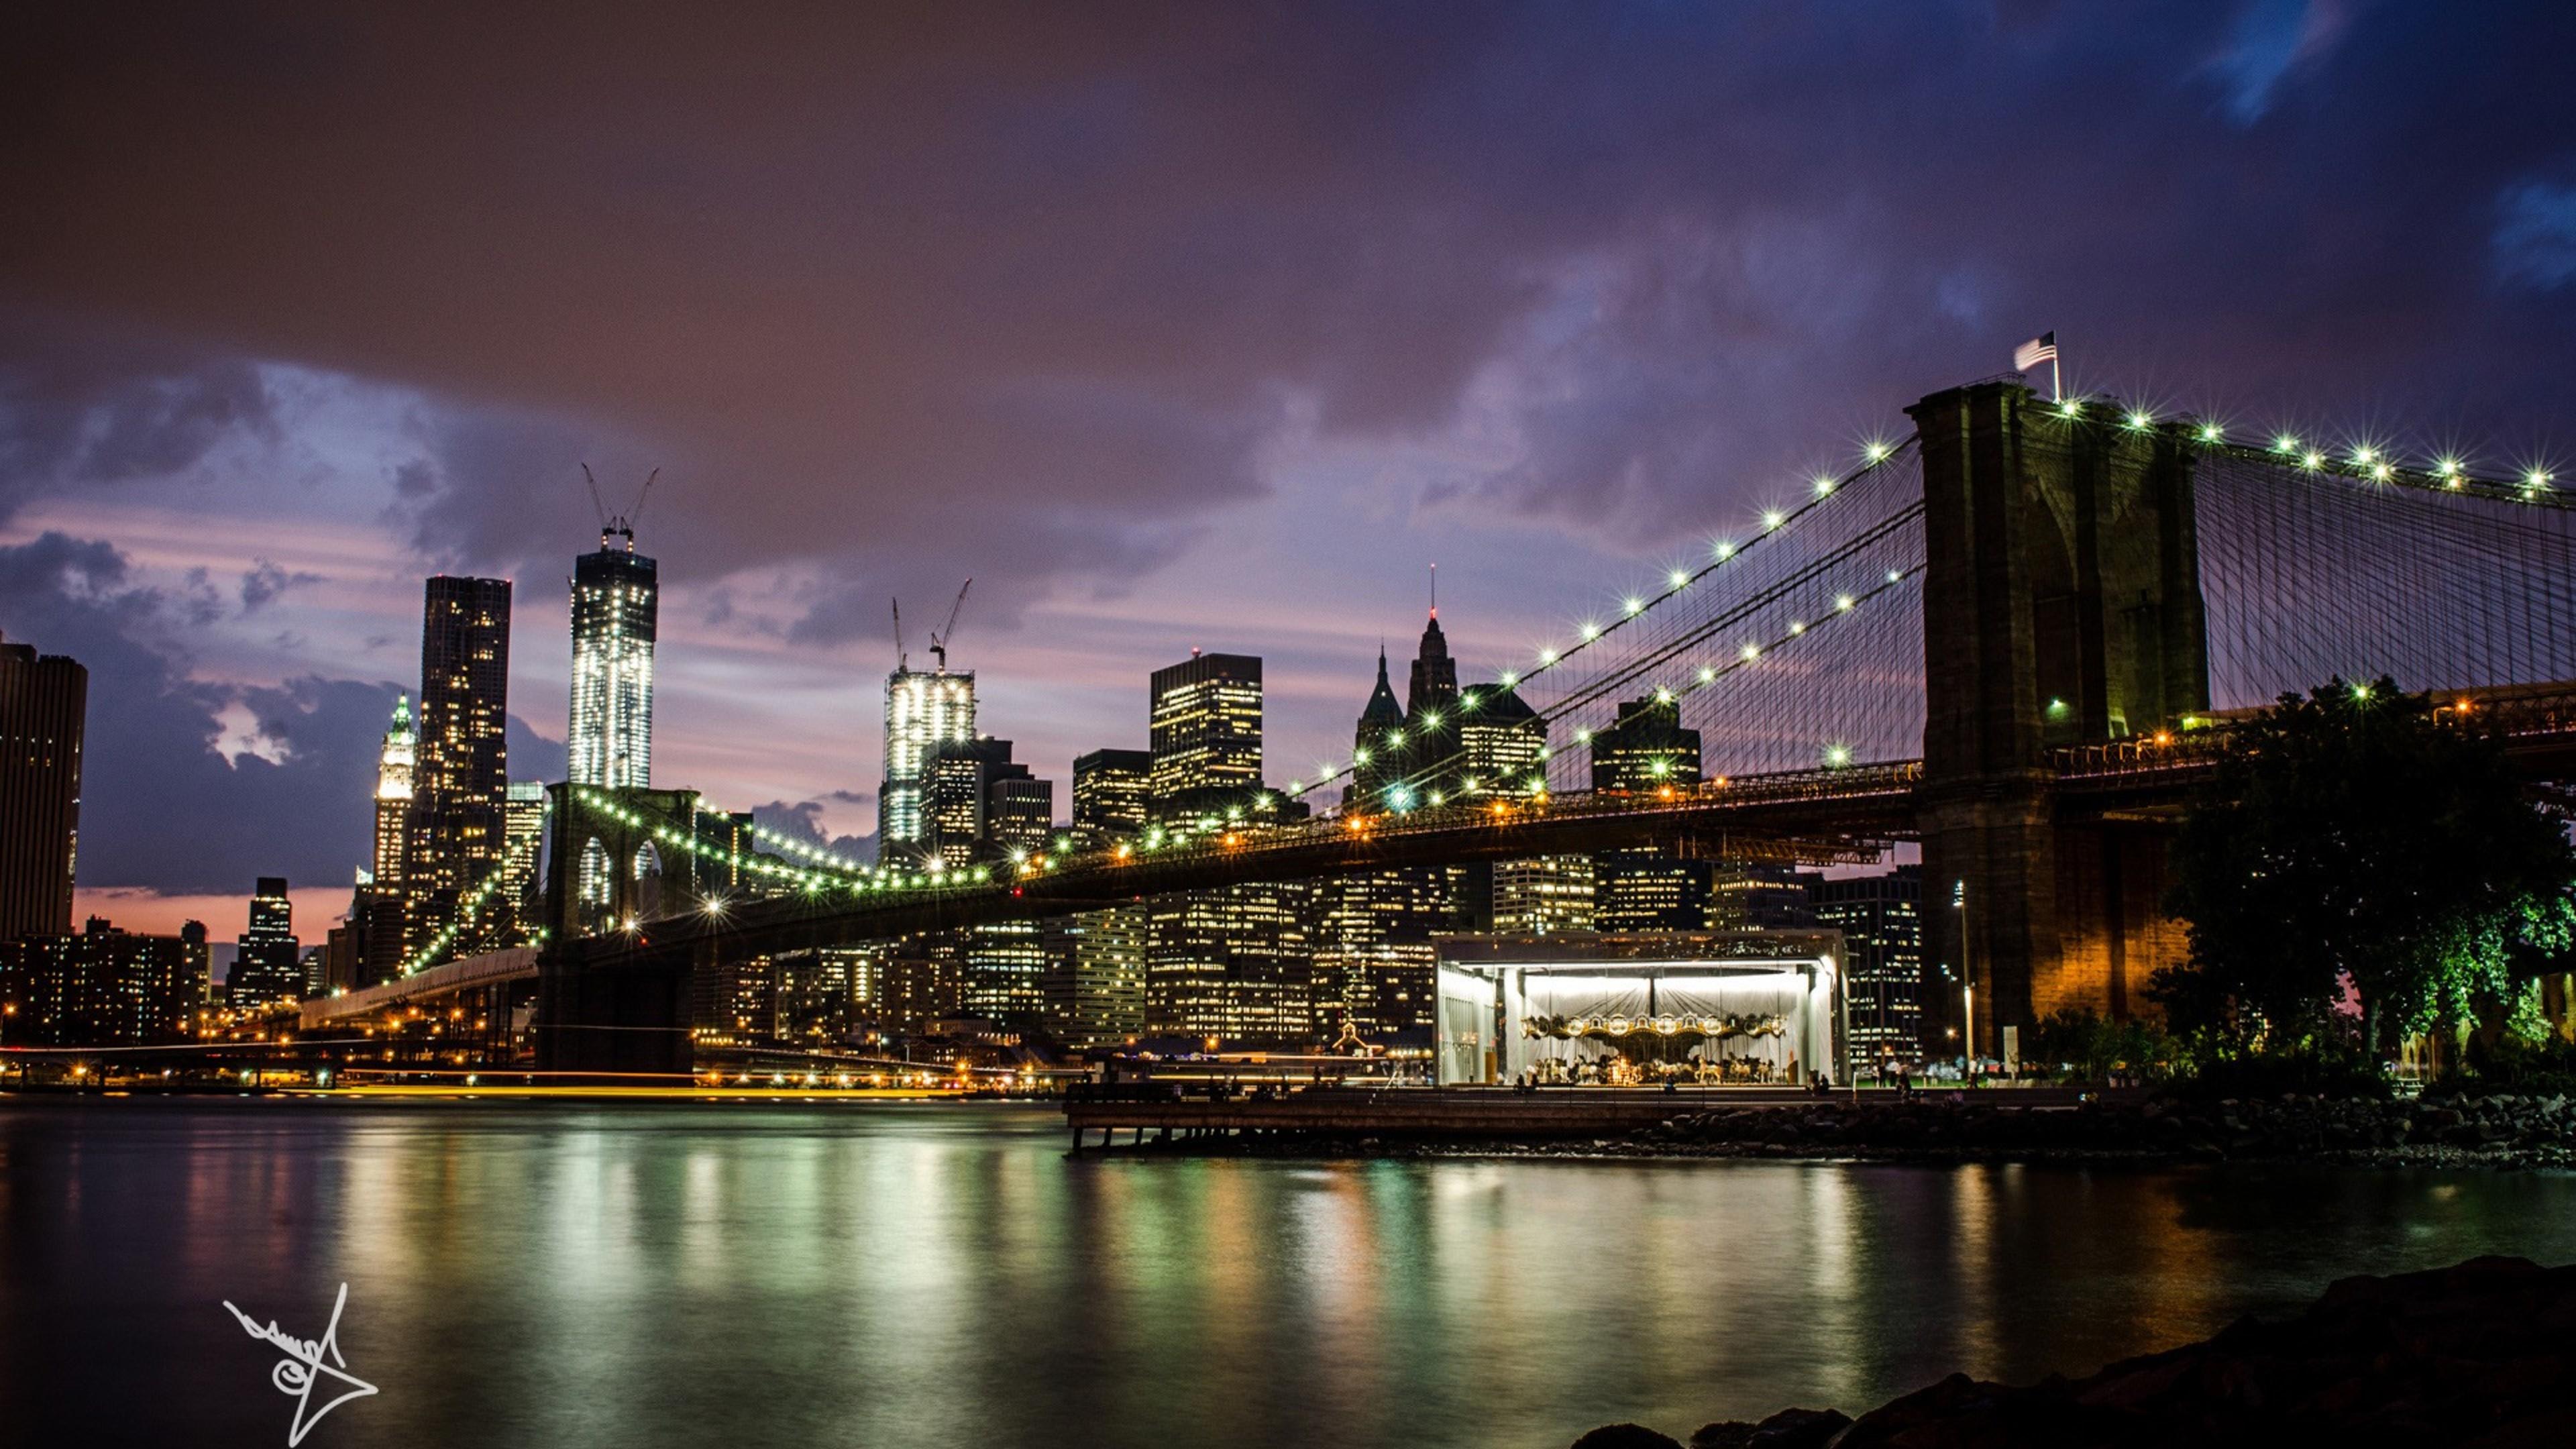 brooklyn bridge manhattan 1538069018 - Brooklyn Bridge Manhattan - world wallpapers, manhattan wallpapers, bridge wallpapers